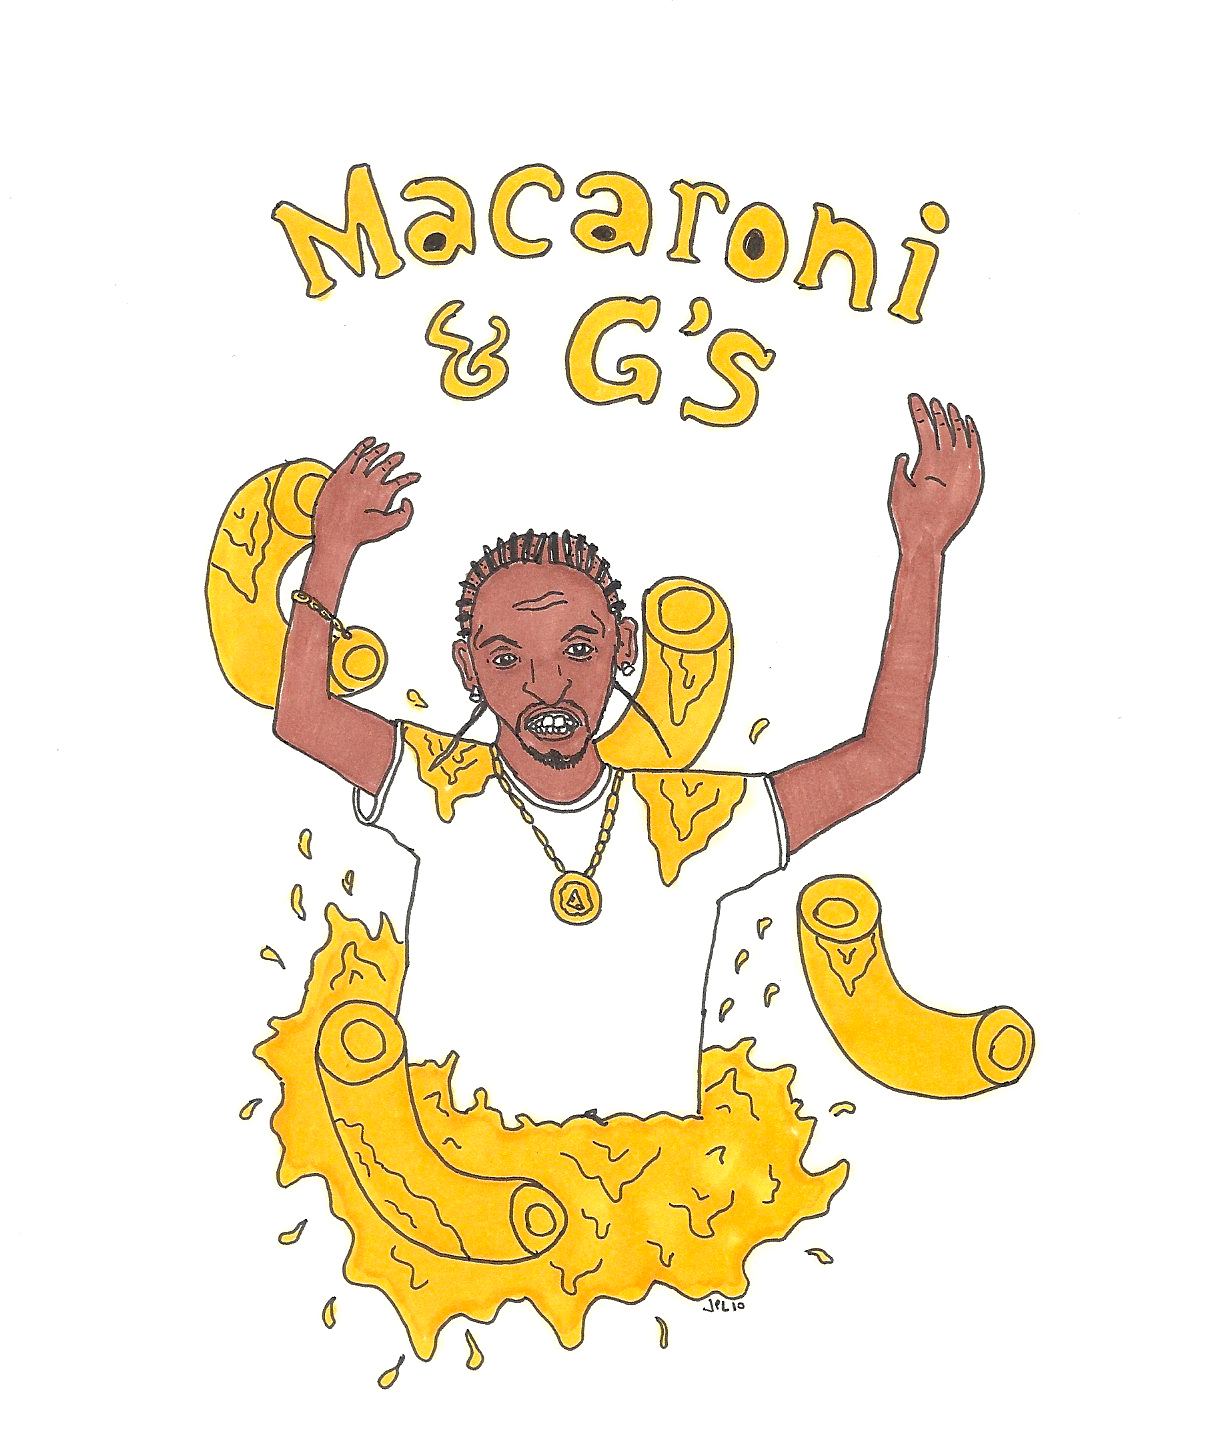 Macaroni & G's